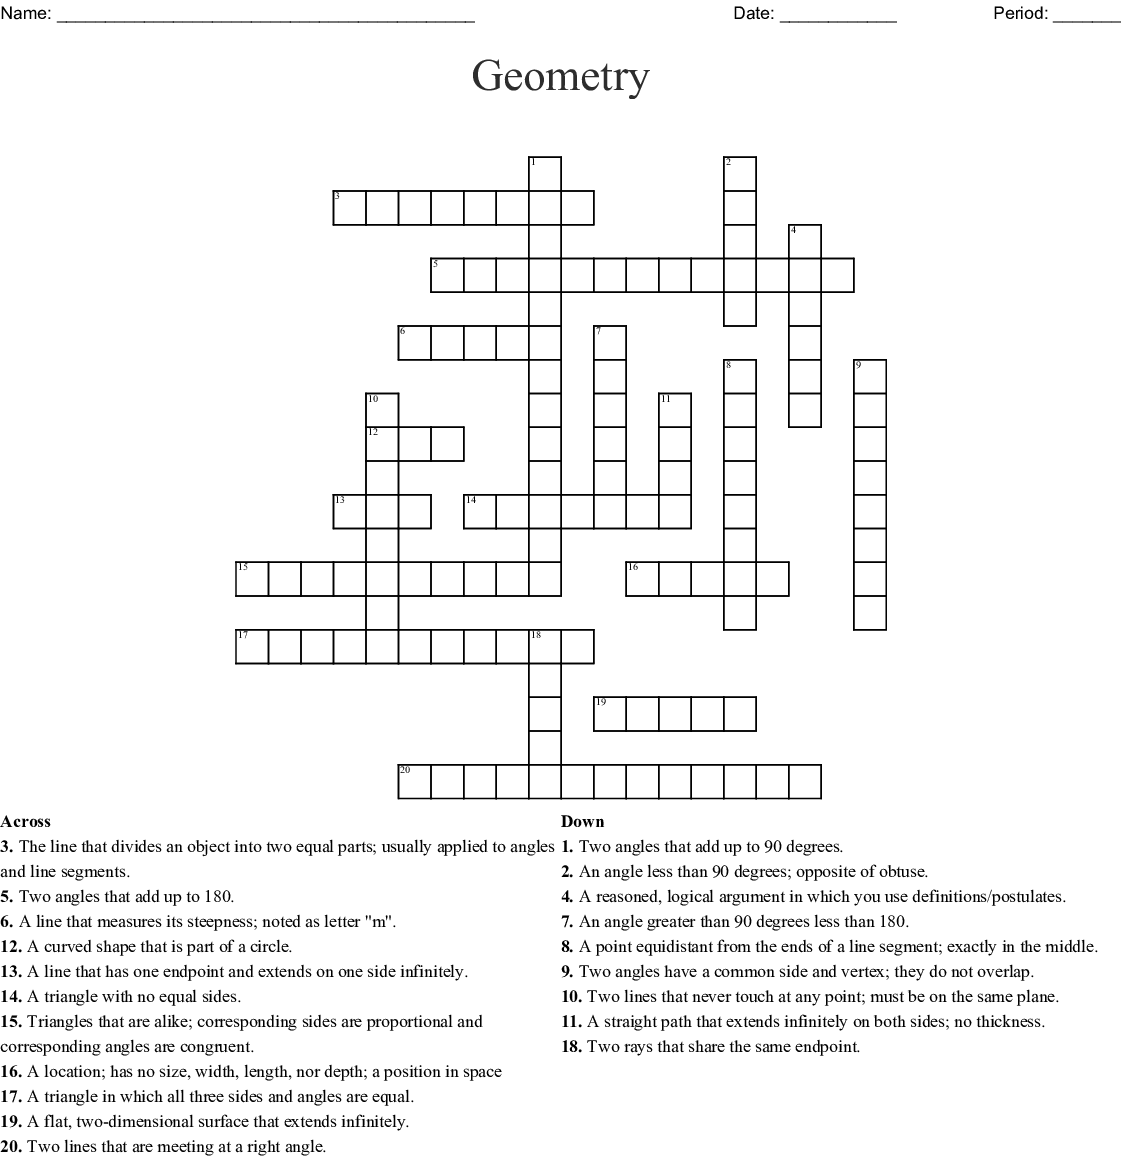 Geometry Crossword